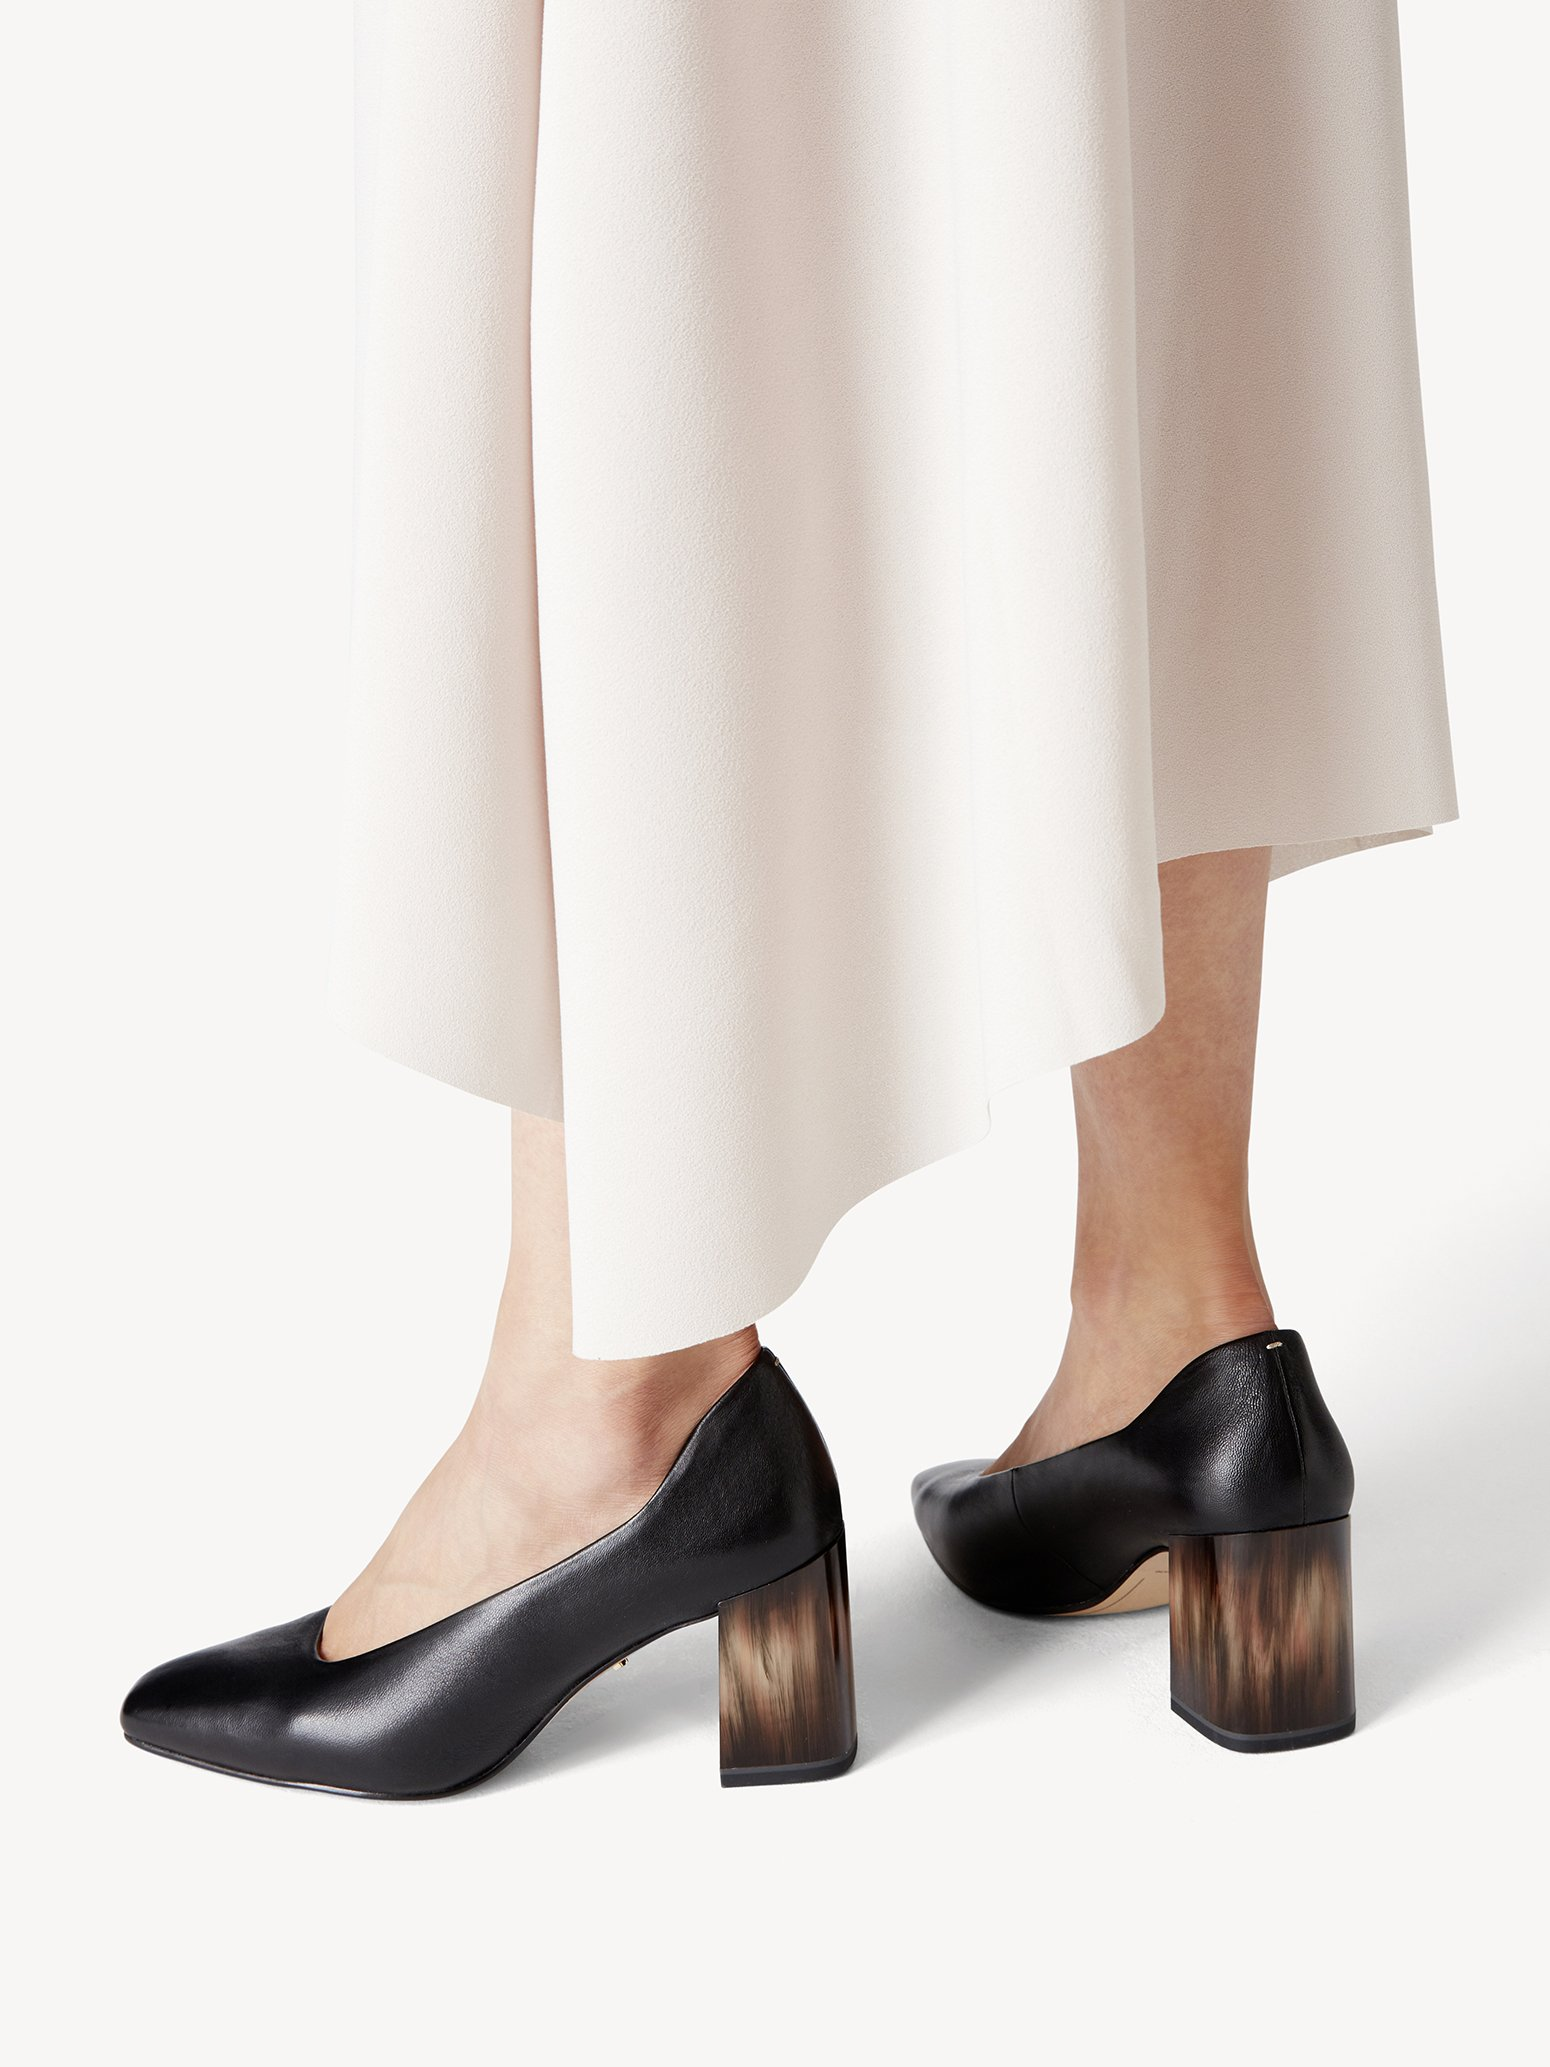 Туфли лодочки Tamaris 1-1-22436-26-003